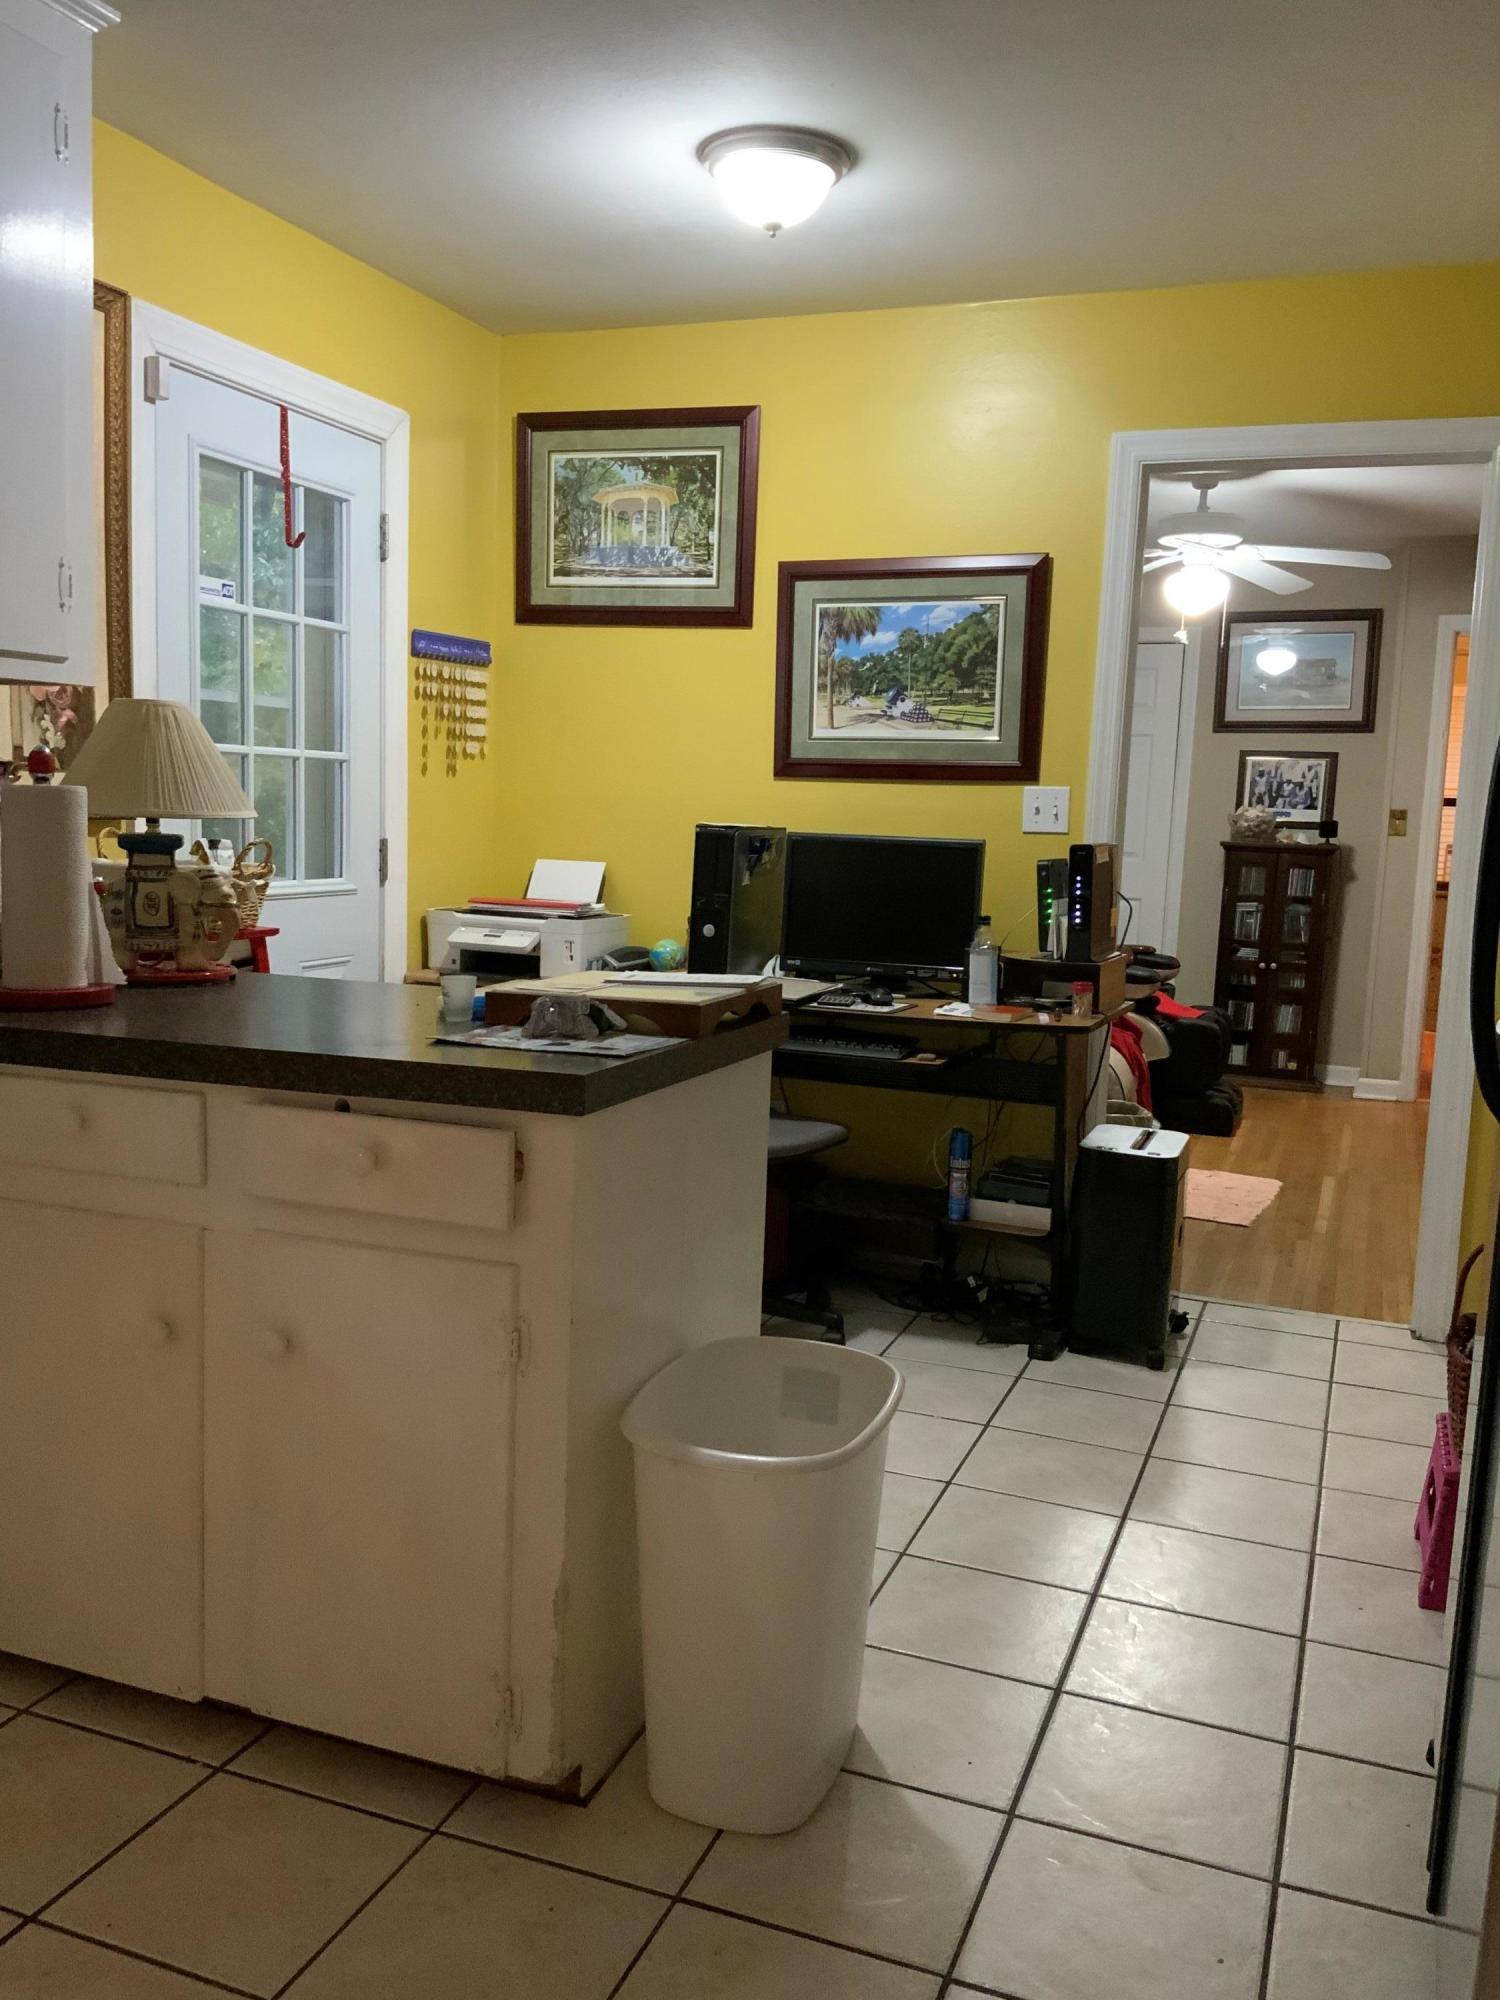 Northbridge Terrace Homes For Sale - 1156 Northbridge, Charleston, SC - 10